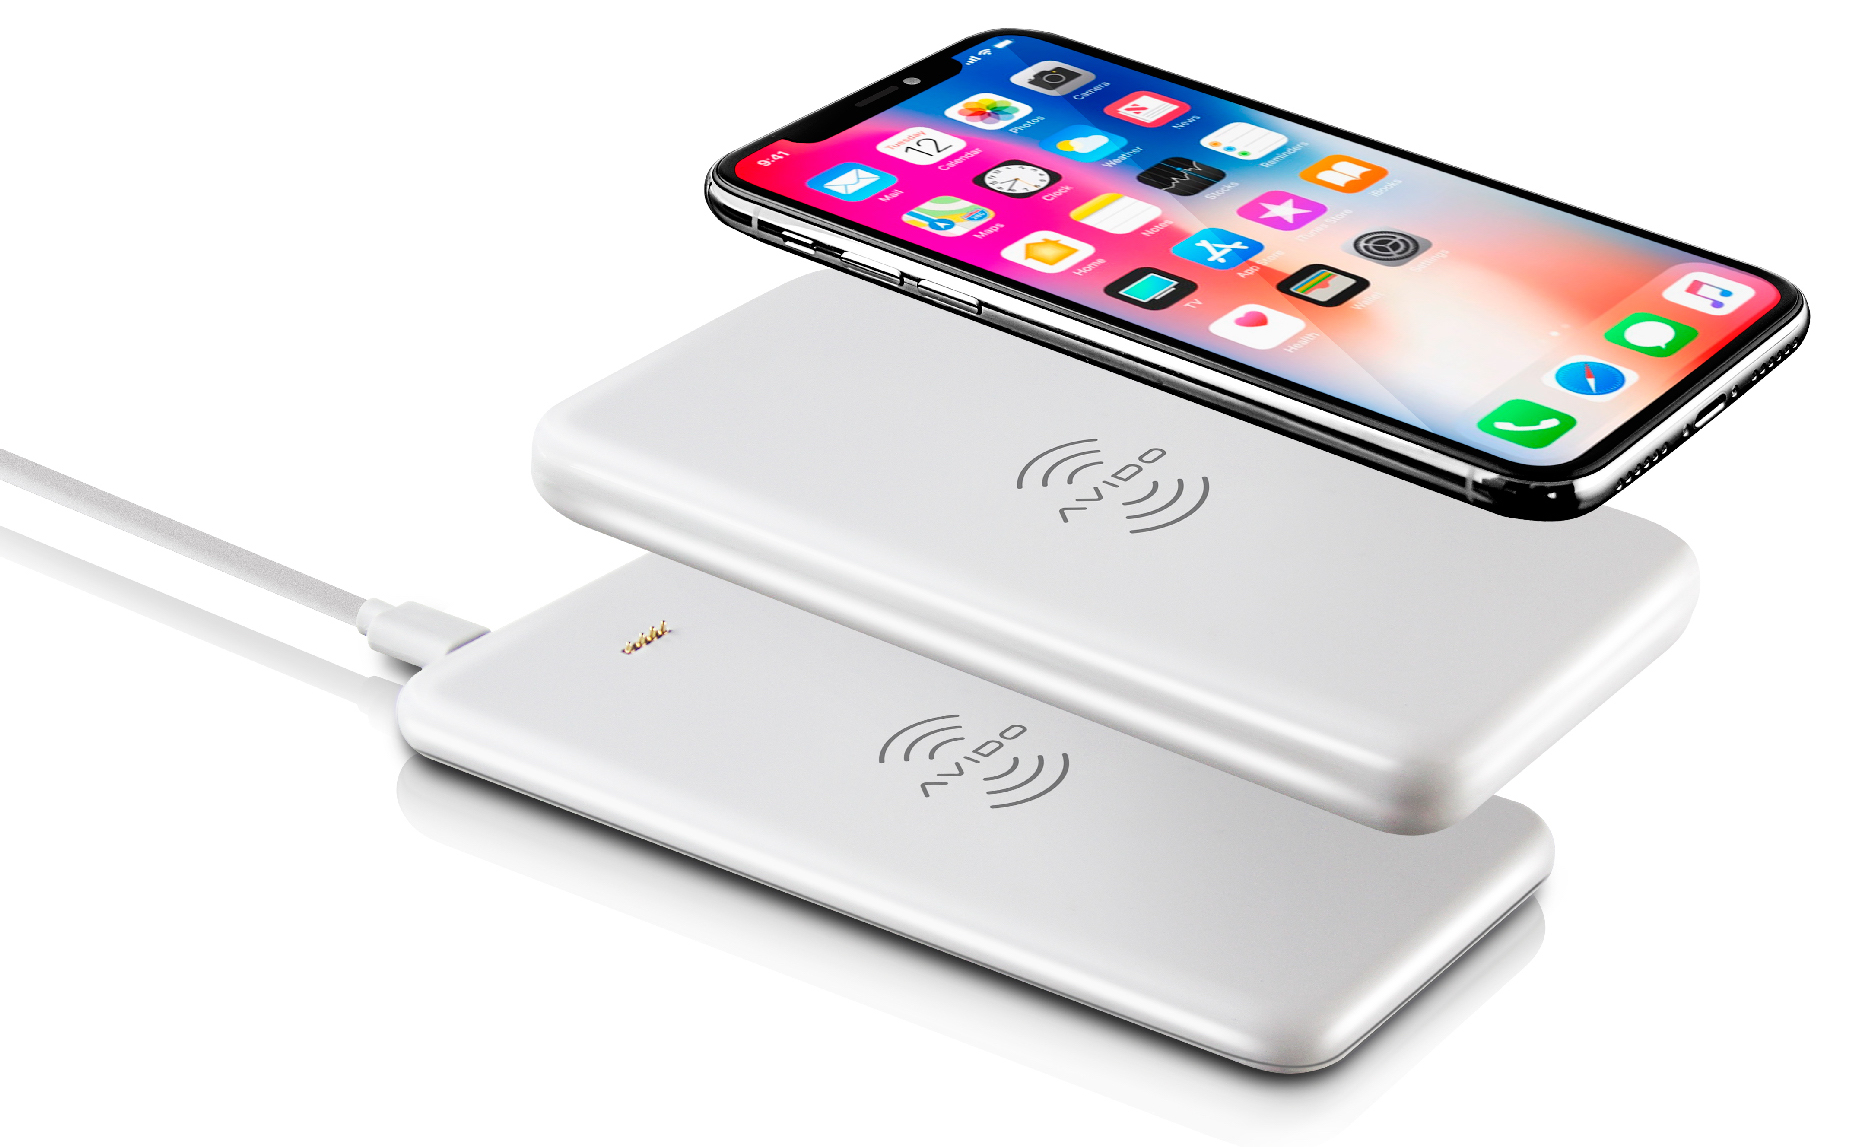 Bateria externa wireless WiBa Power Bank, da Avido